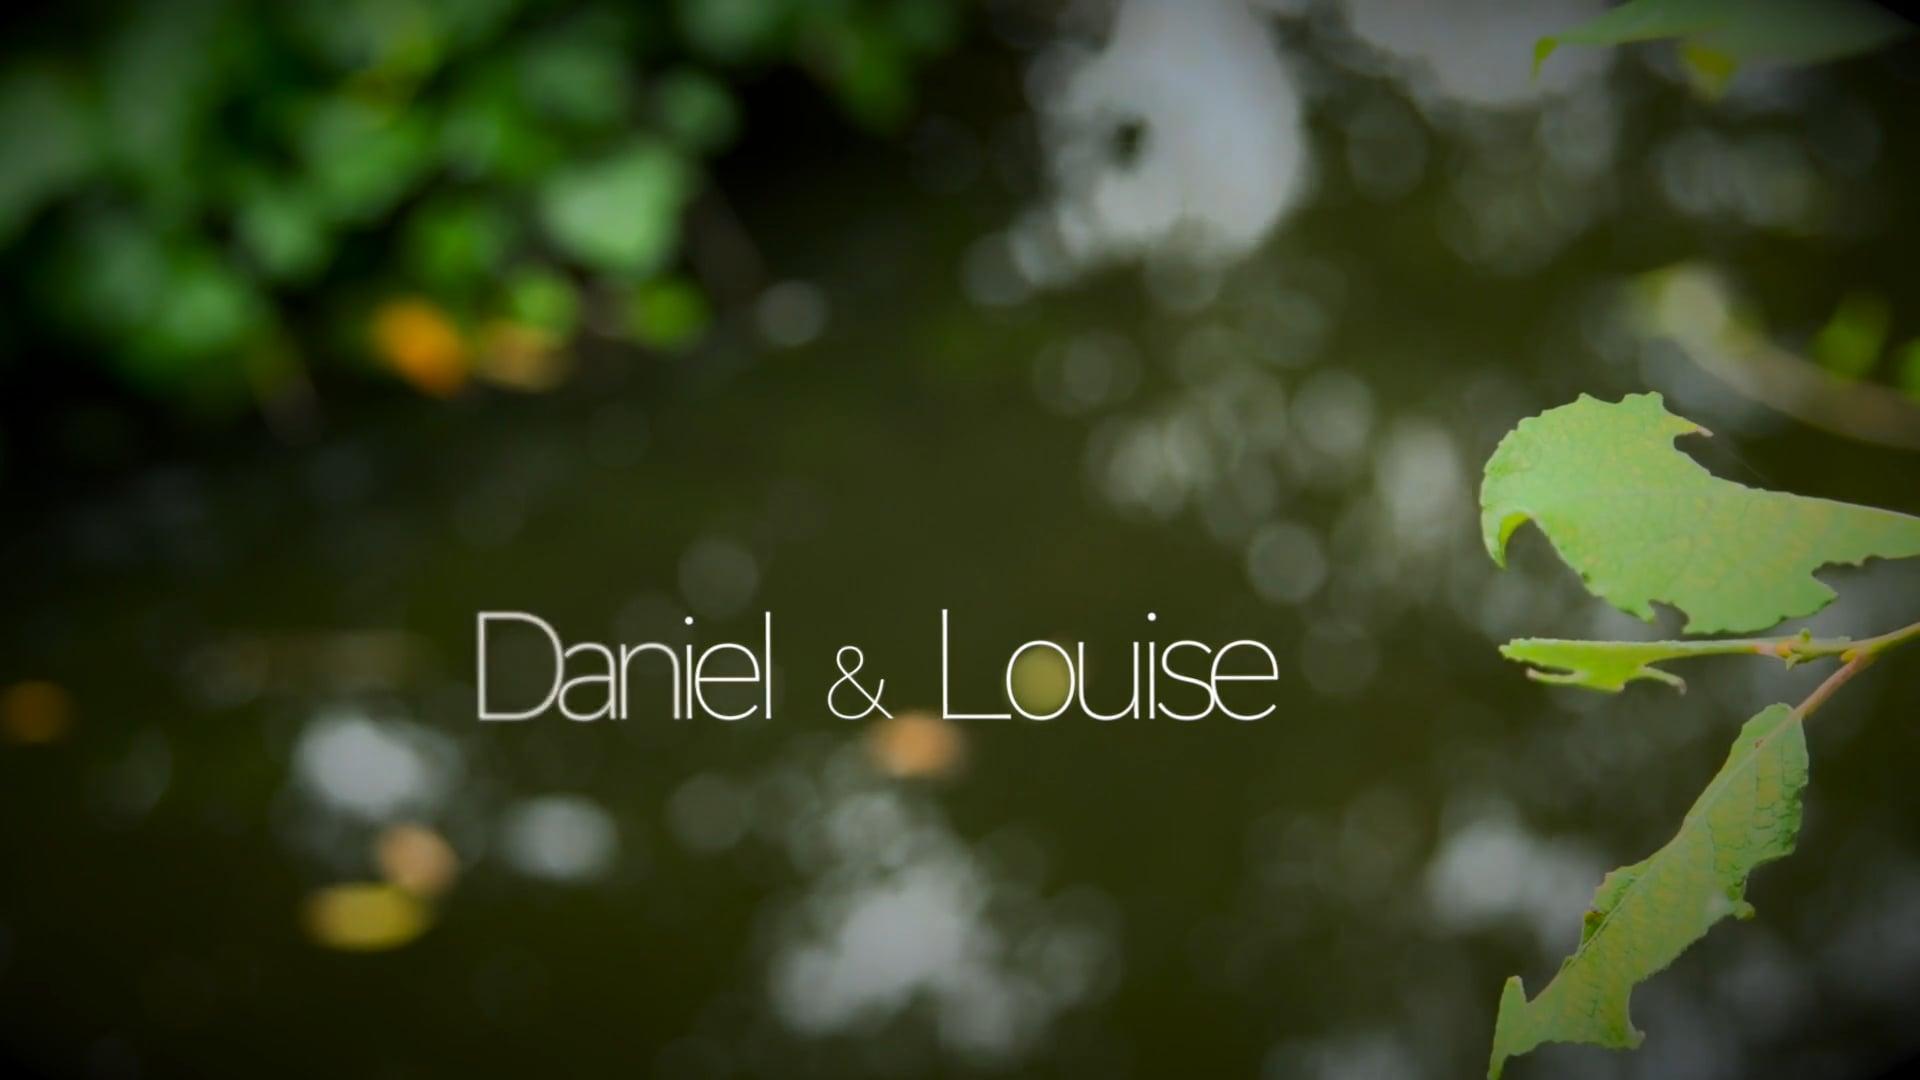 Daniel & Louise Music Video